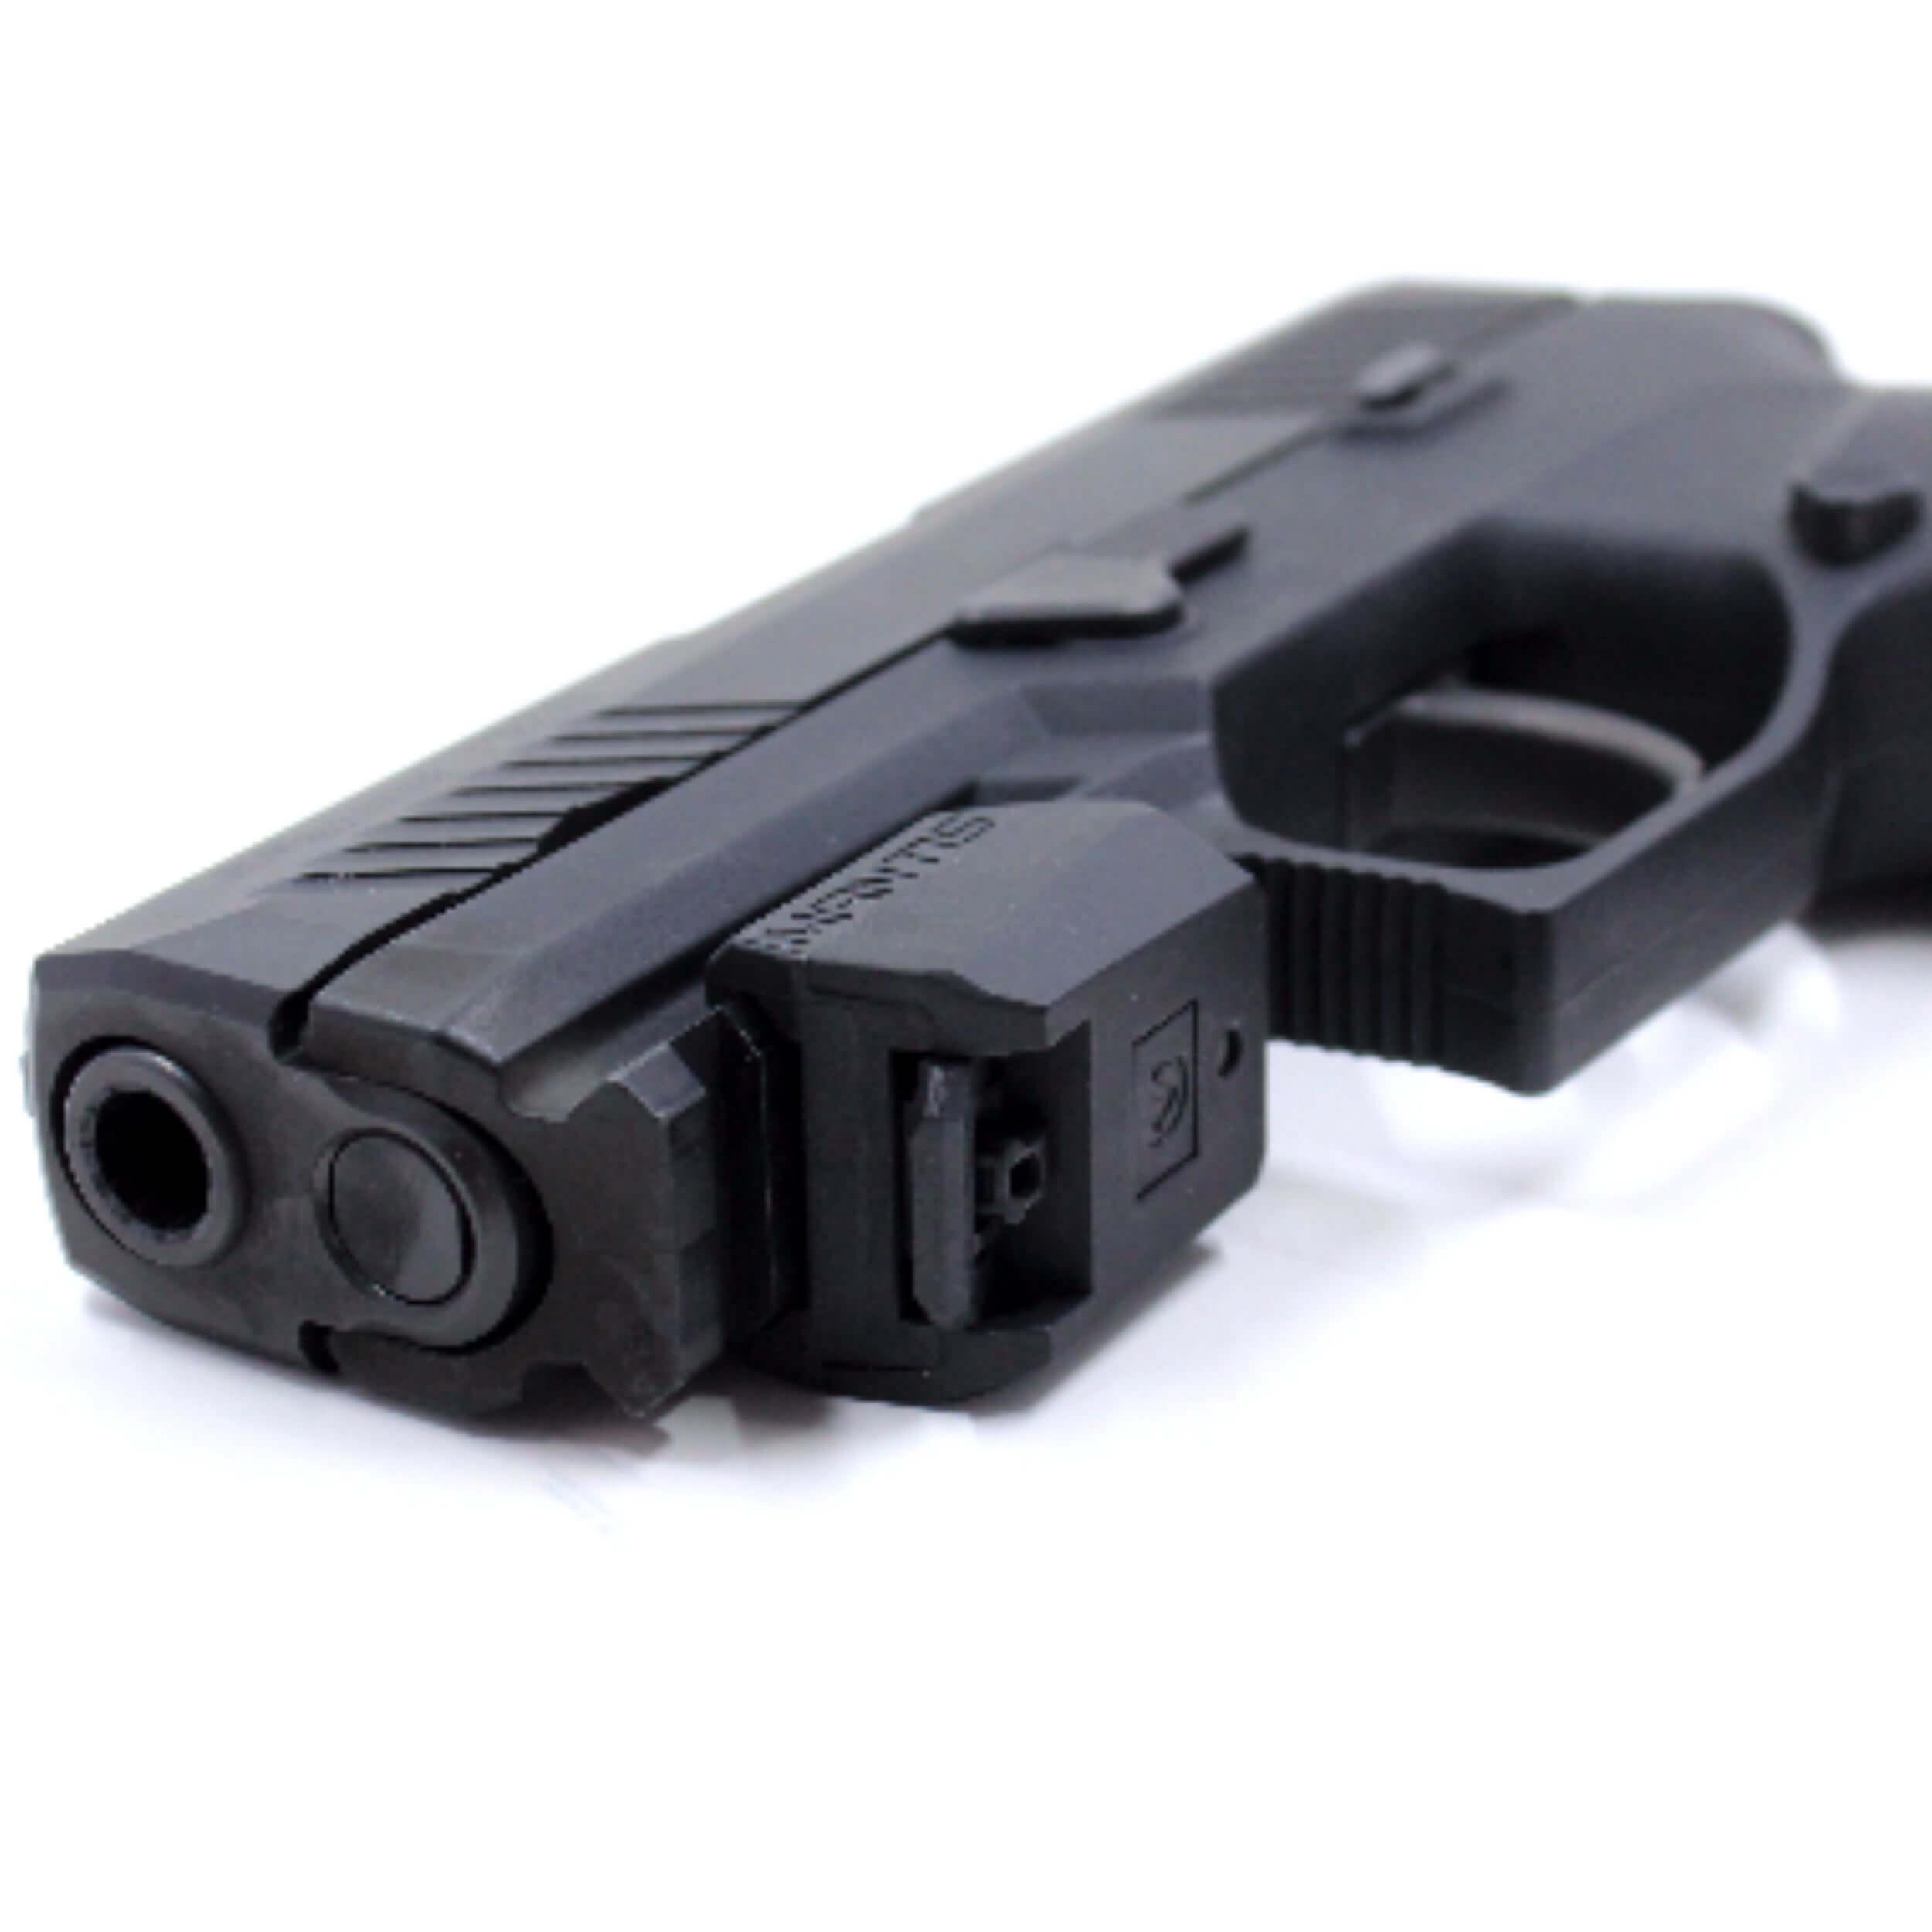 MANTIS X3 - SHOOTING PERFORMANCE SYSTEM